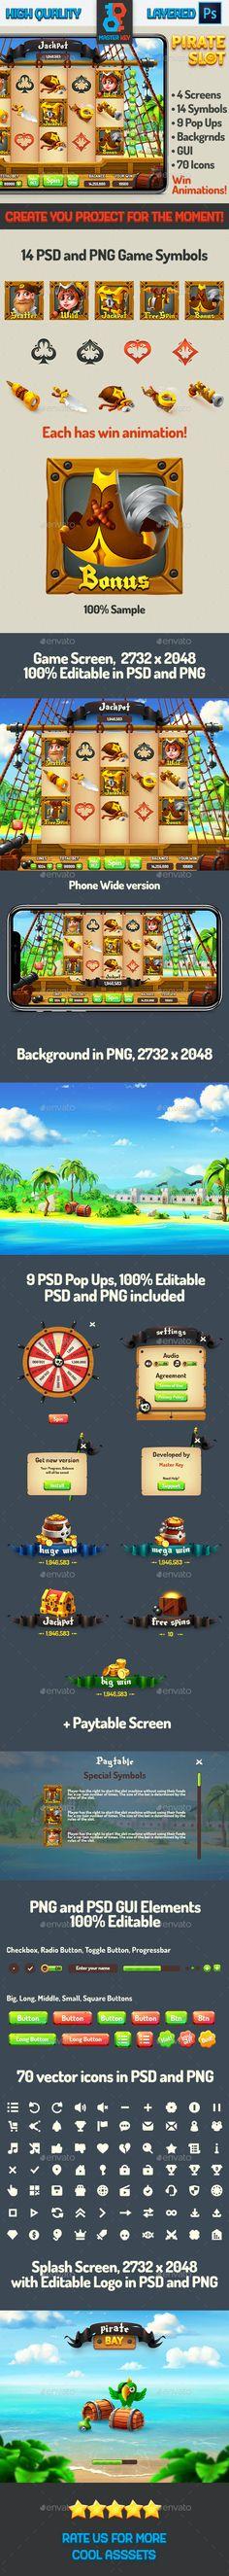 Full Pirate Bay Slot Asset by Master_Key | GraphicRiver Game Gui, Master Key, Progress Bar, Splash Screen, Special Symbols, Game Background, Game Logo, Retina Display, Casino Games